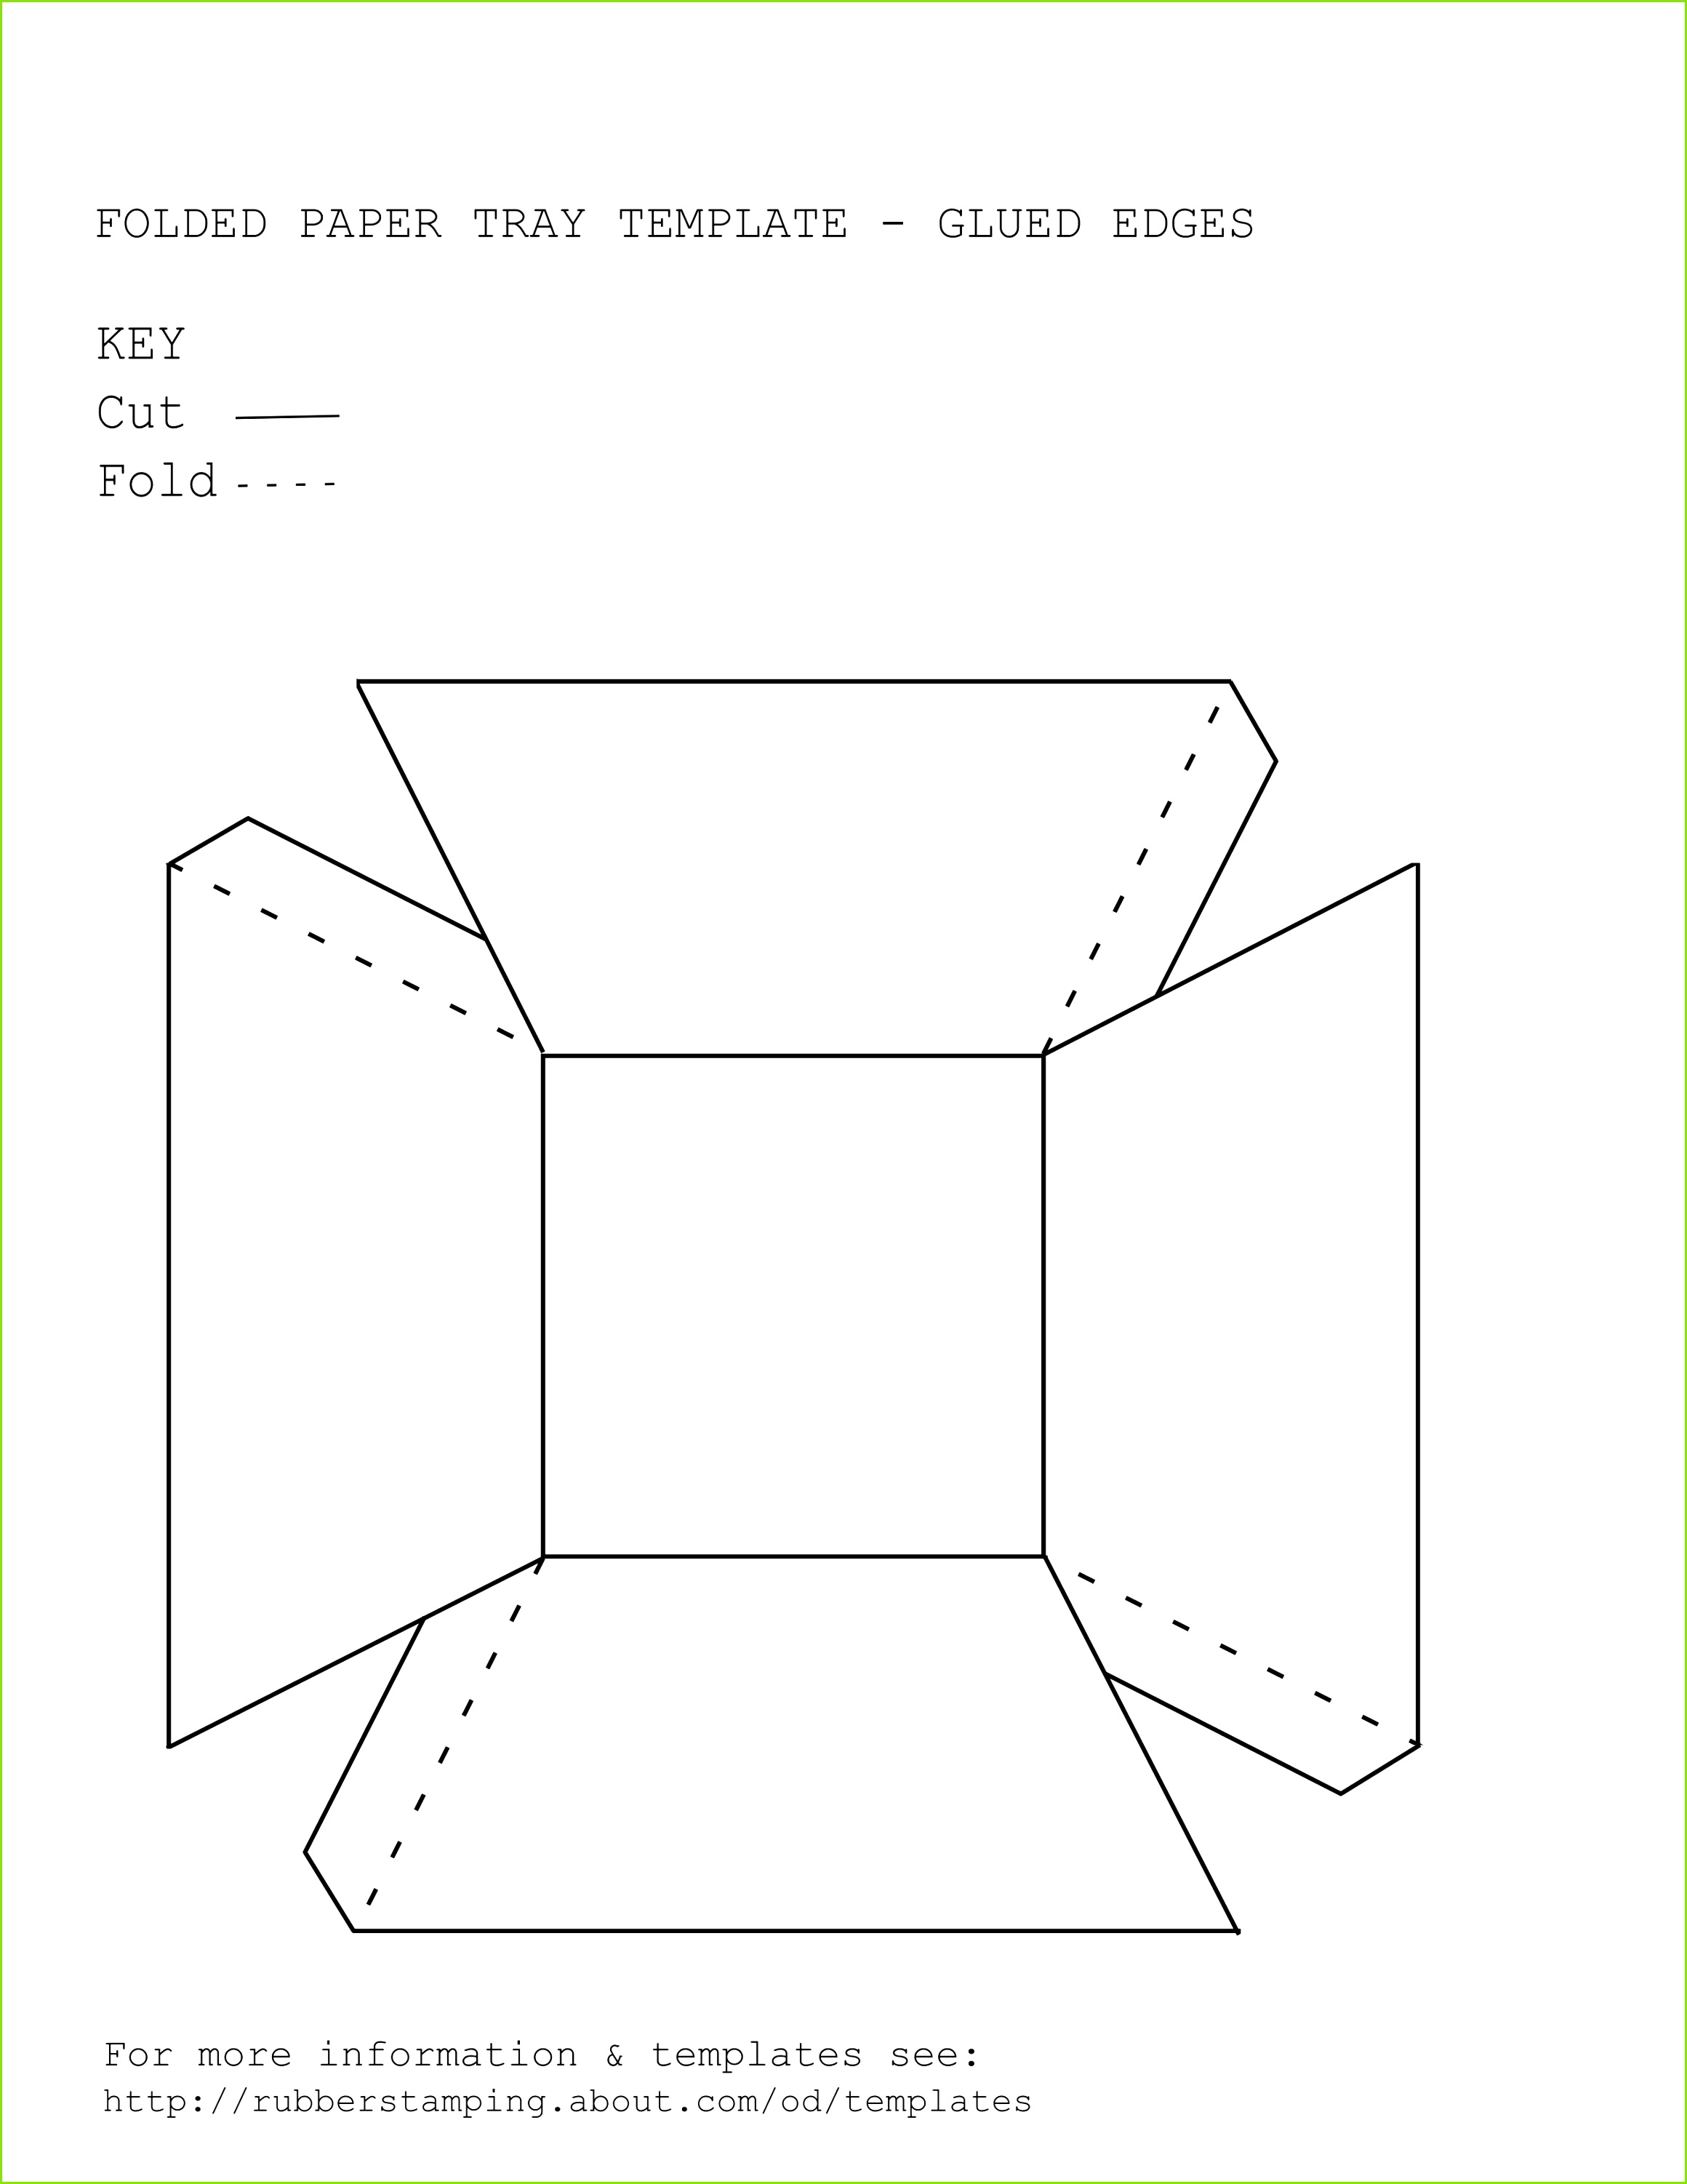 Folded Paper Tray flap 56a80bd83df78cf7729ba56a